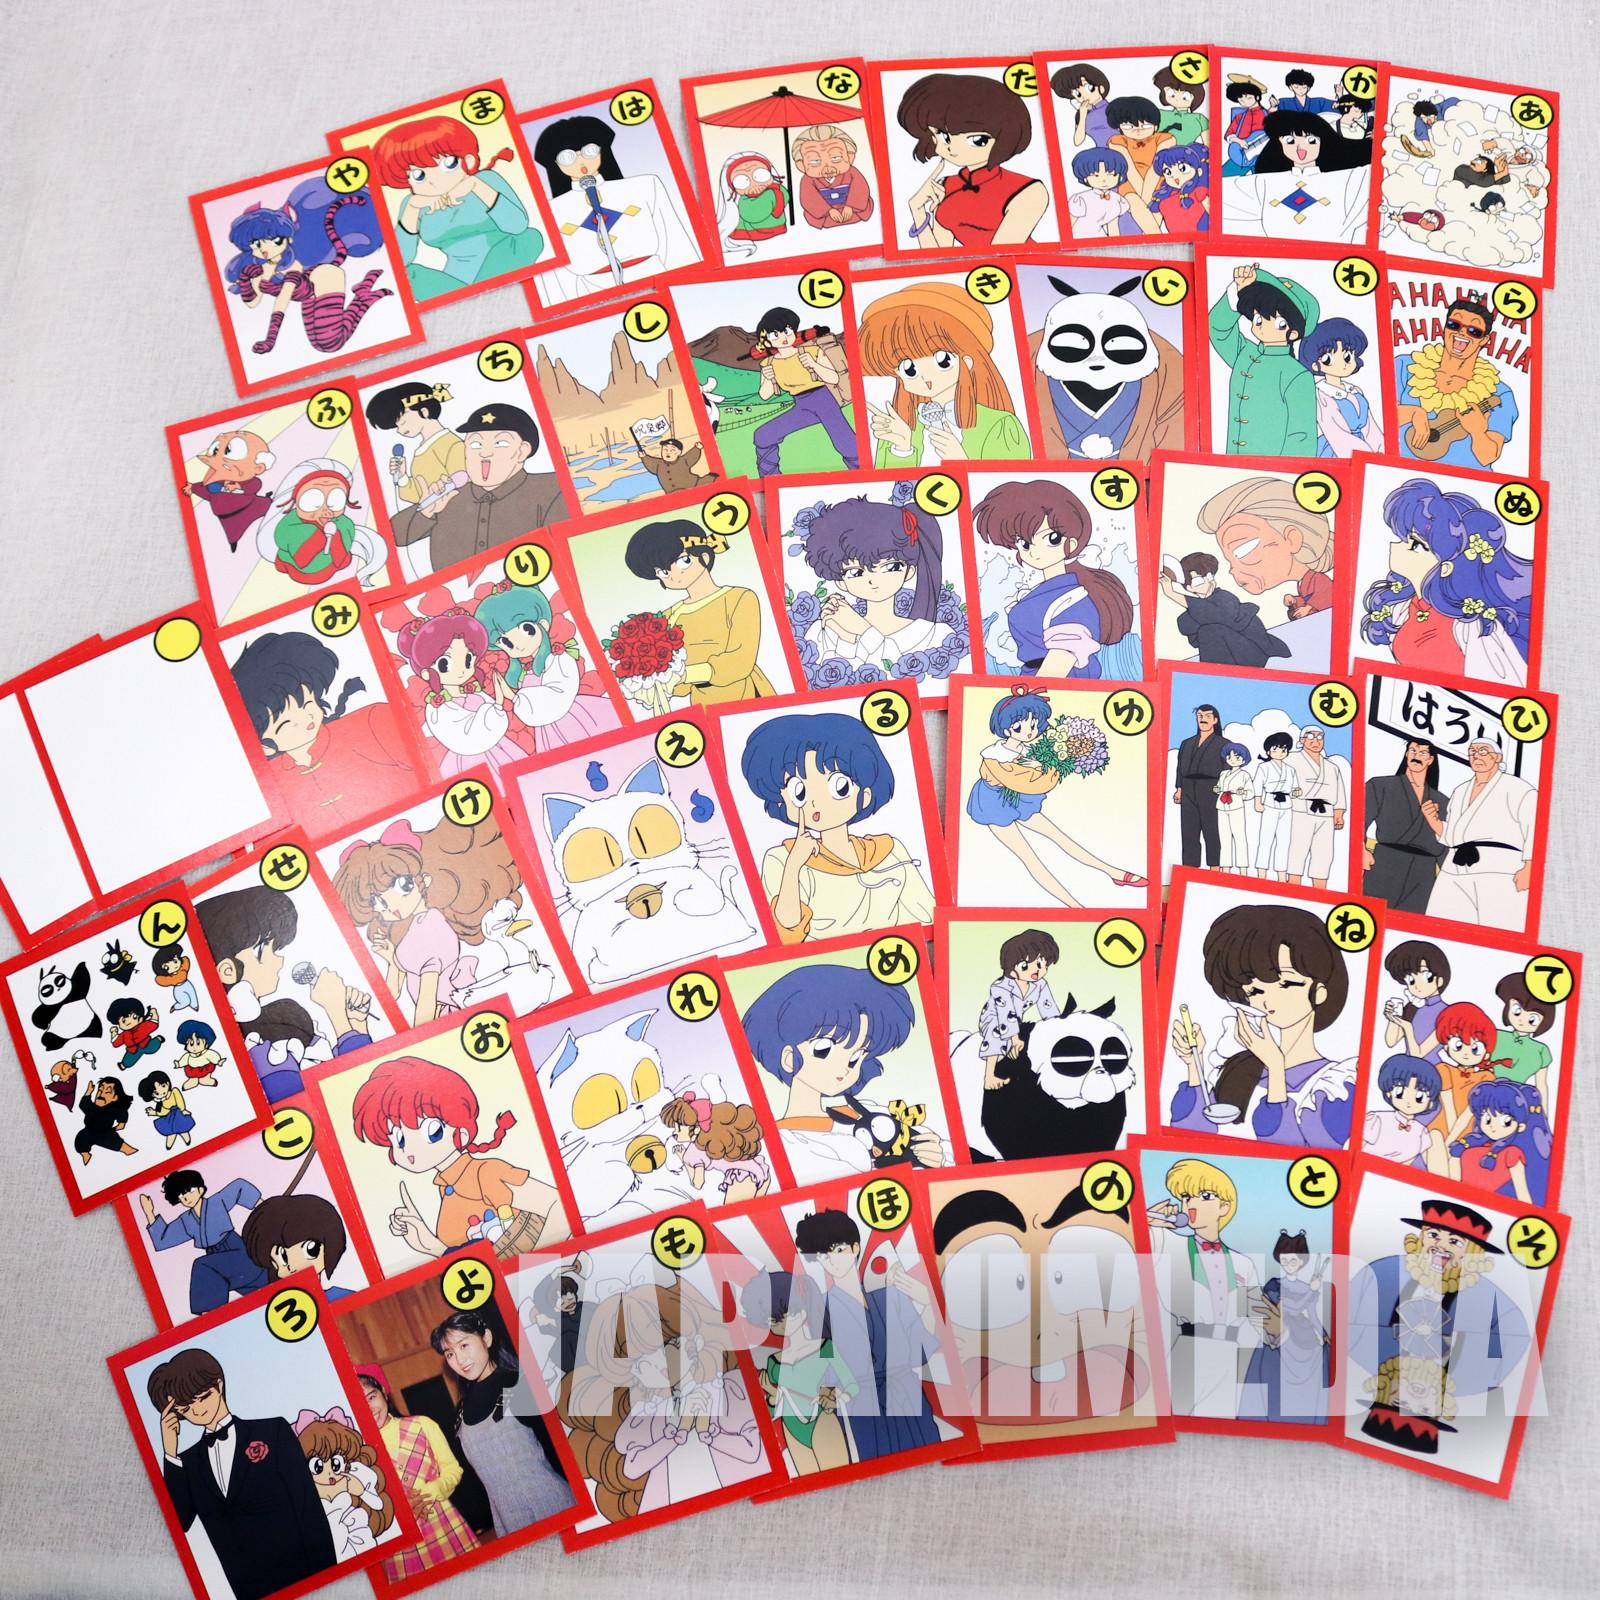 Ranma 1/2 KARUTA Japanese Card Game ANIME RUMIKO TAKAHASHI